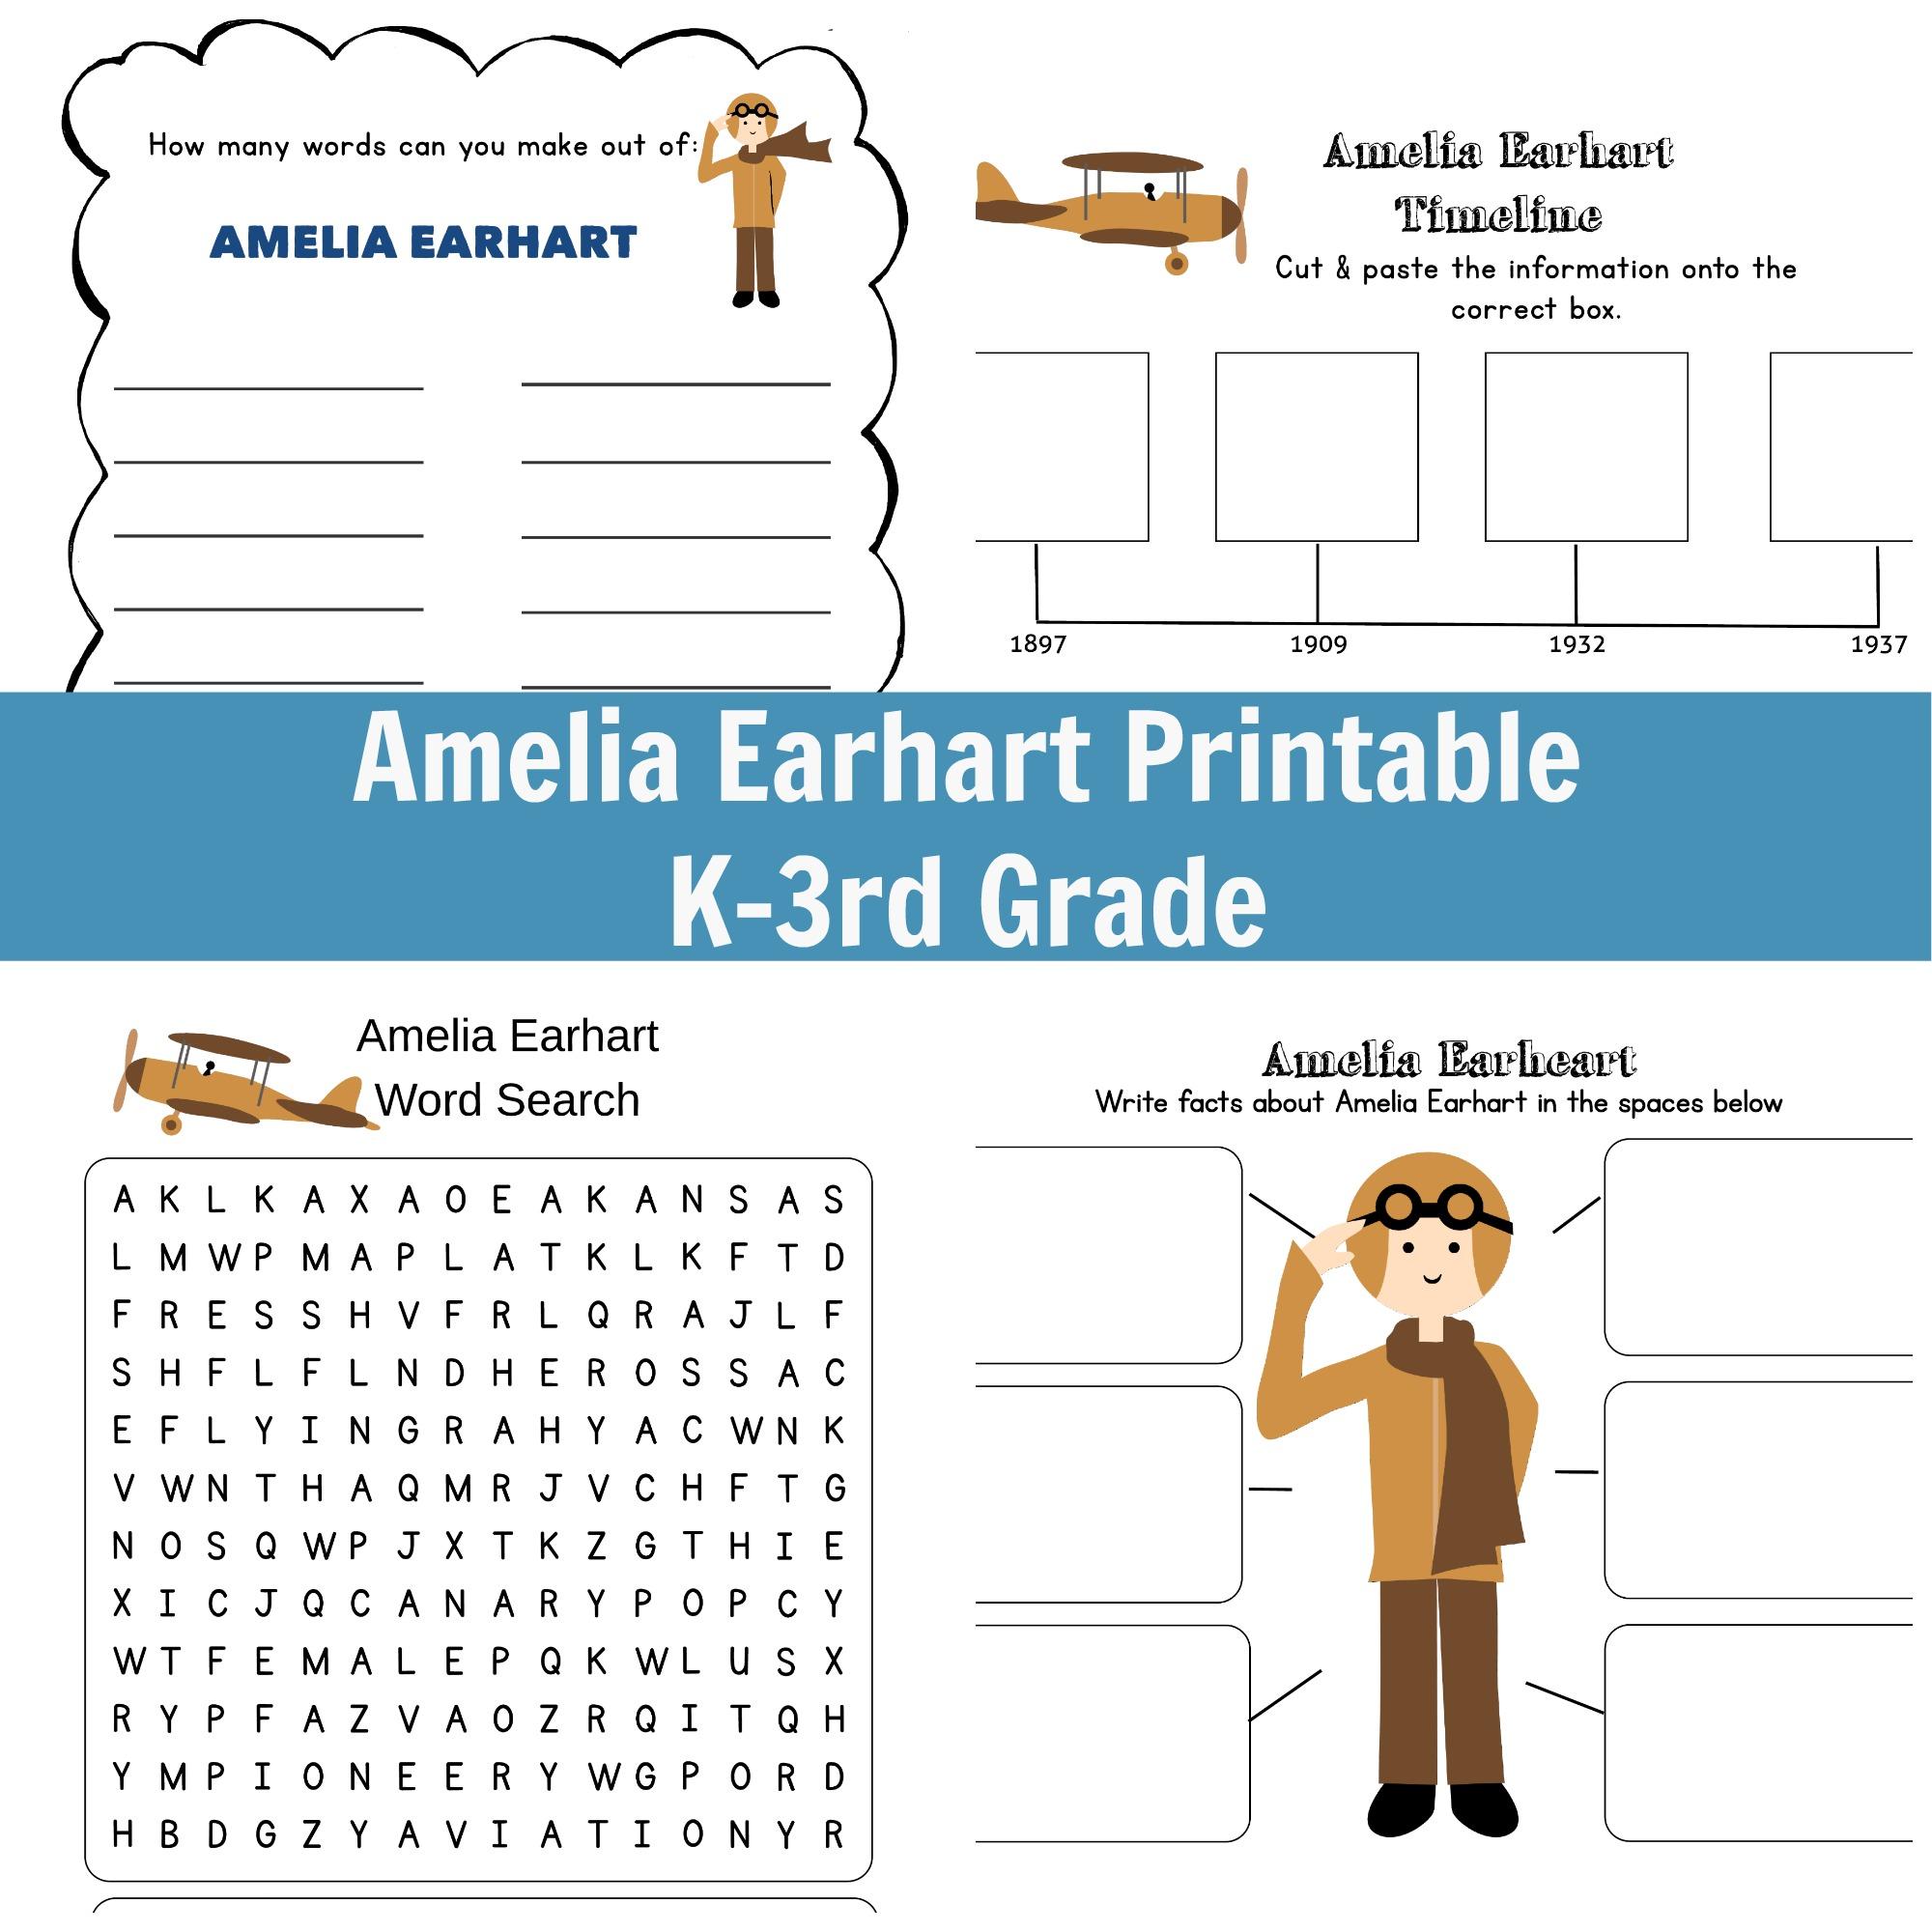 medium resolution of Amelia Earhart Printable - Grades K-3